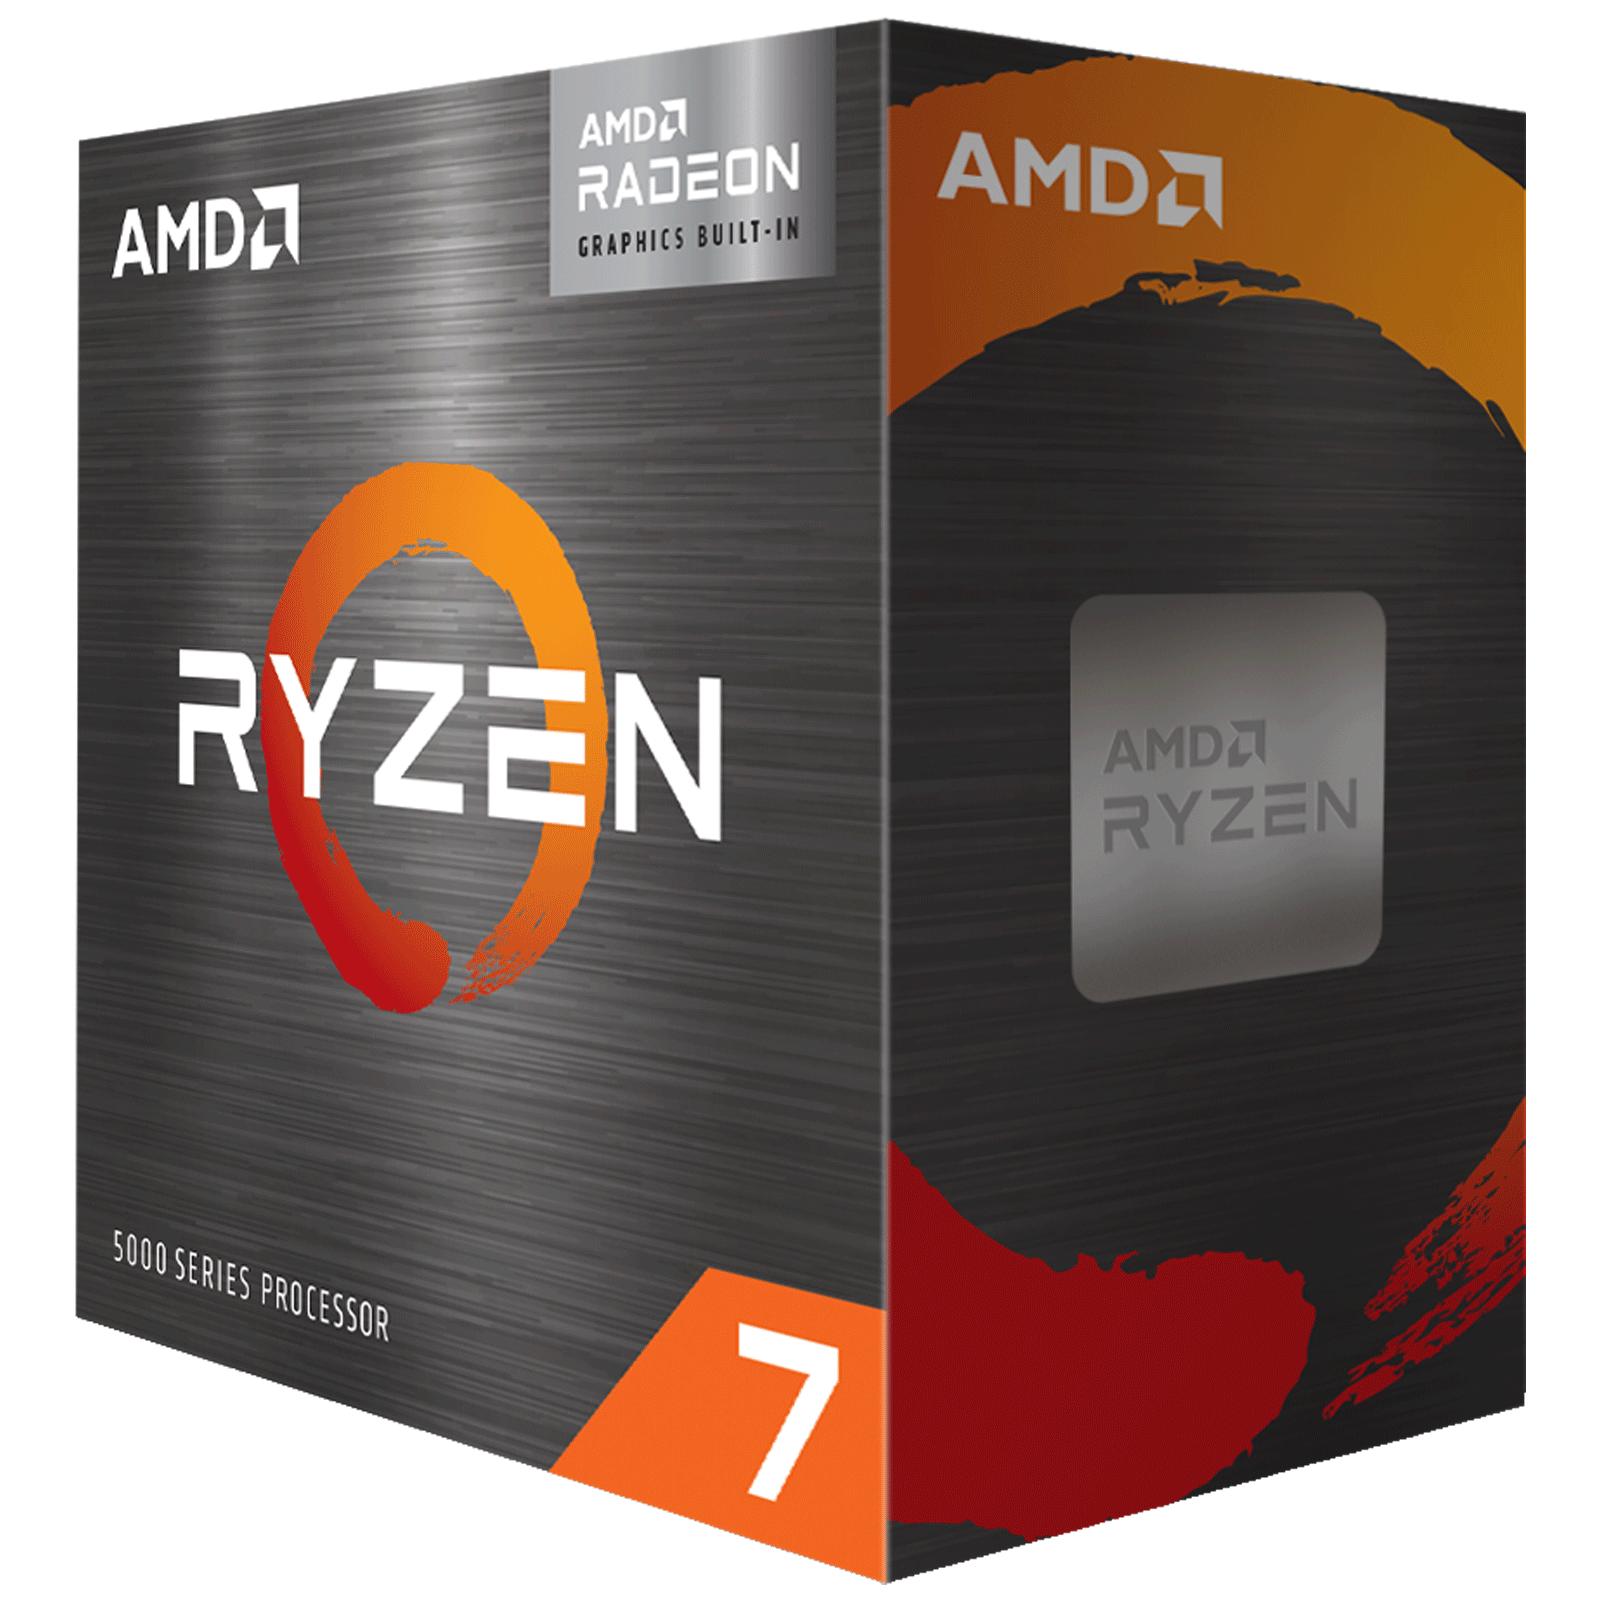 AMD Ryzen 7 Desktop Processor (8 Cores, 3.8 GHz, PCIe 3, 5700G, Silver)_2